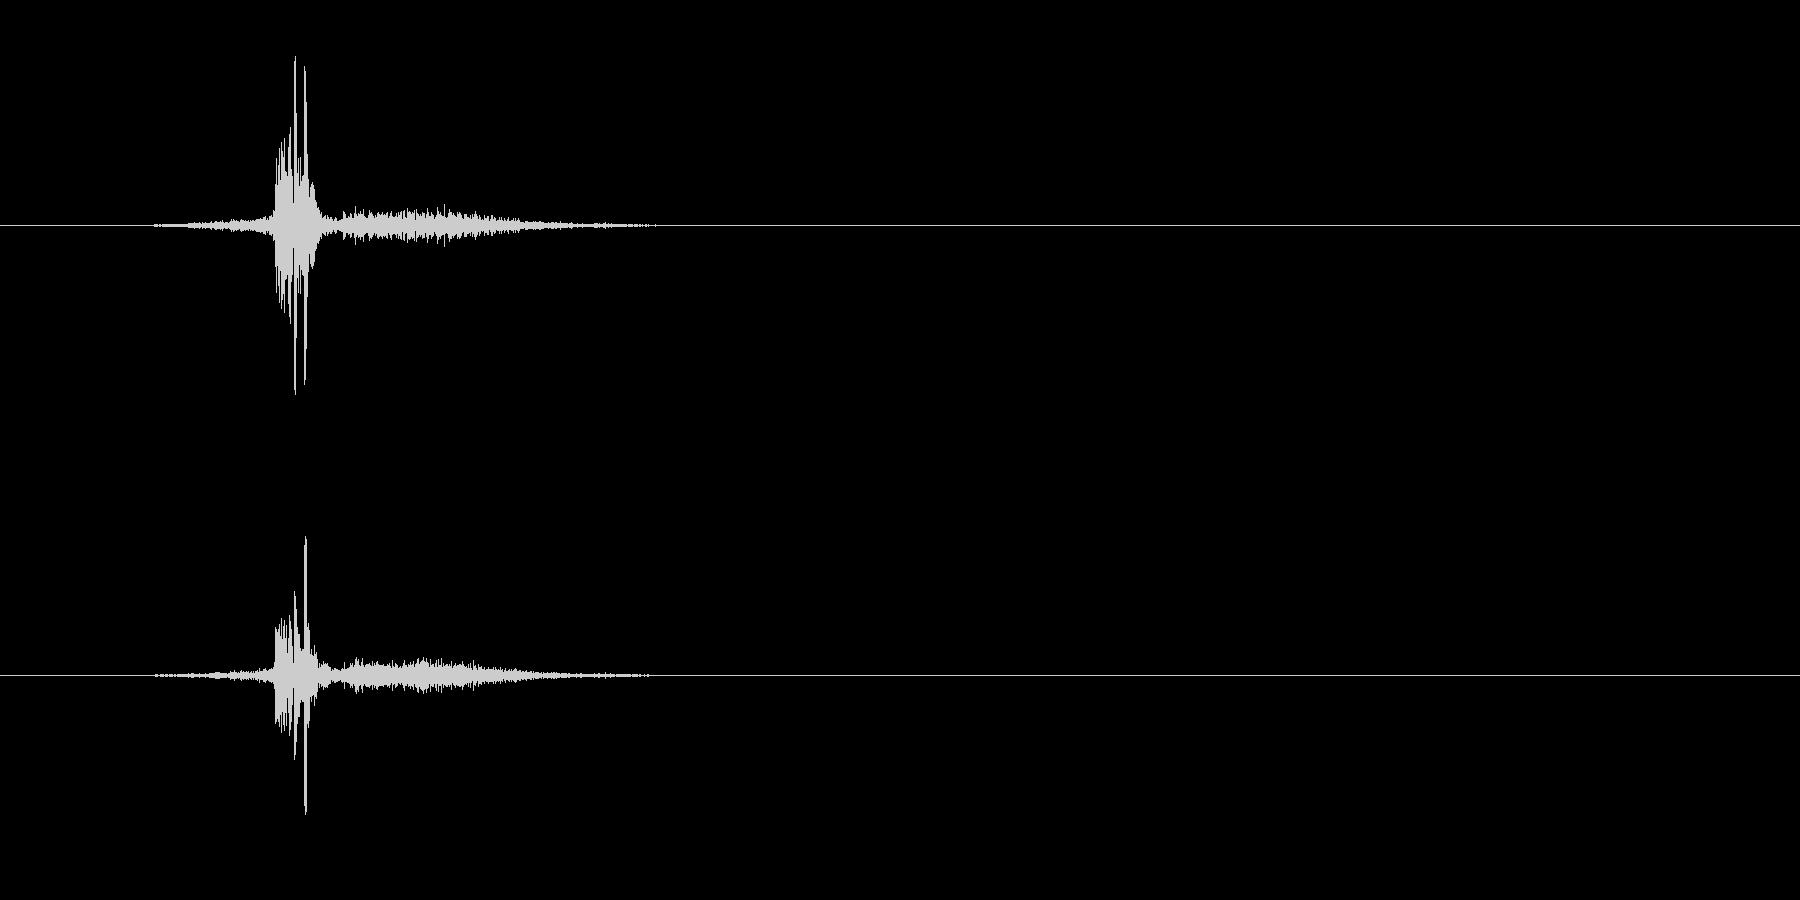 ZIPPO(ジッポ)を閉める音 真鍮無垢の未再生の波形